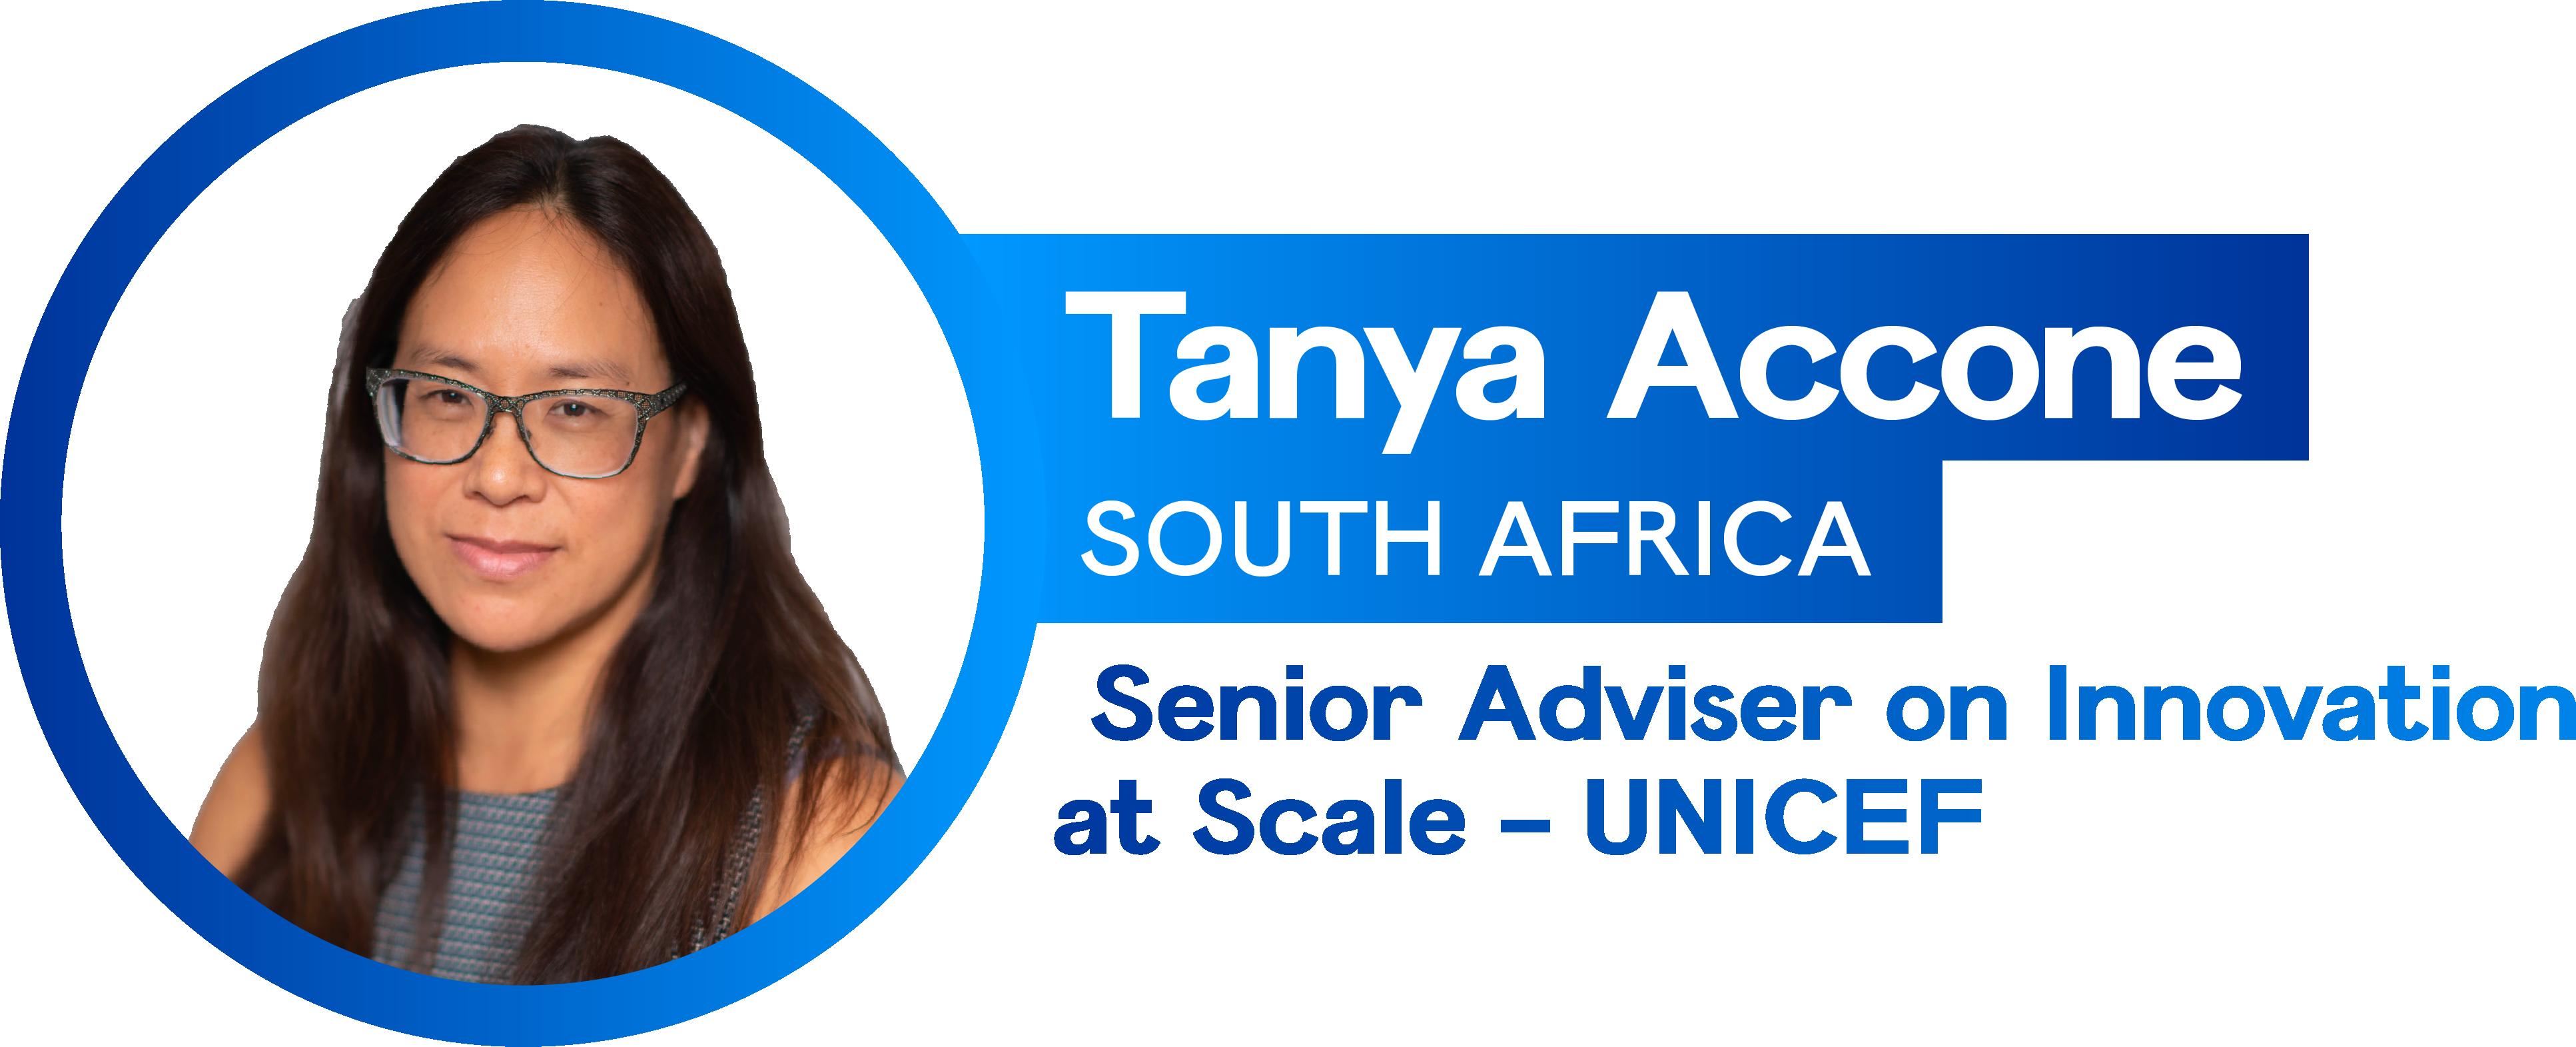 Tanya Accone